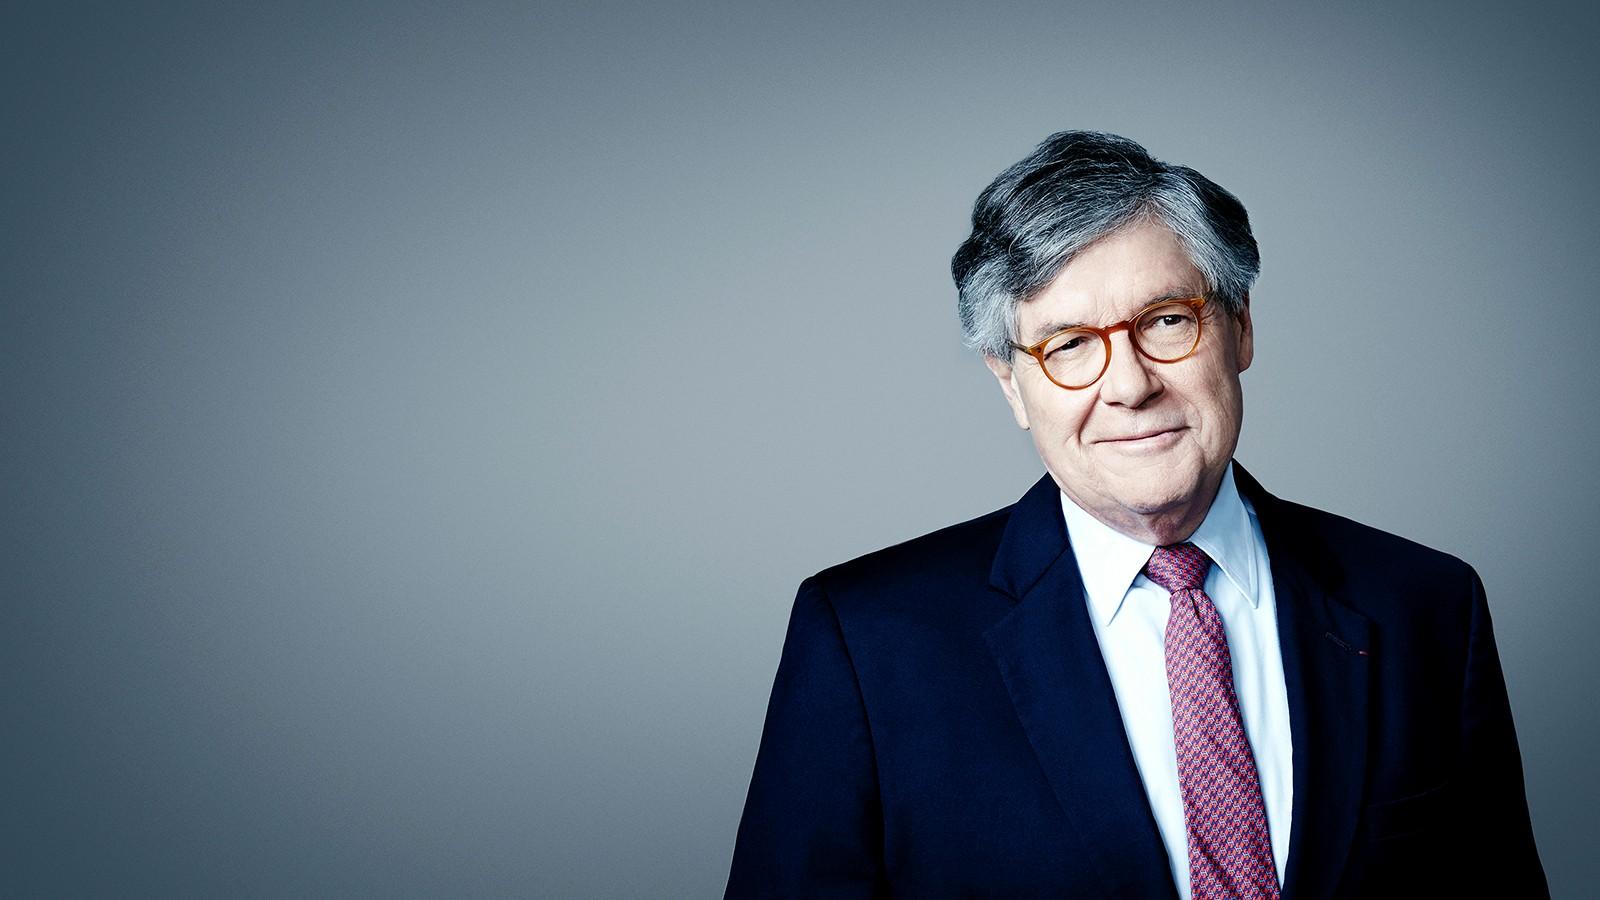 CNN Profiles - Jim Bittermann - Senior International ...